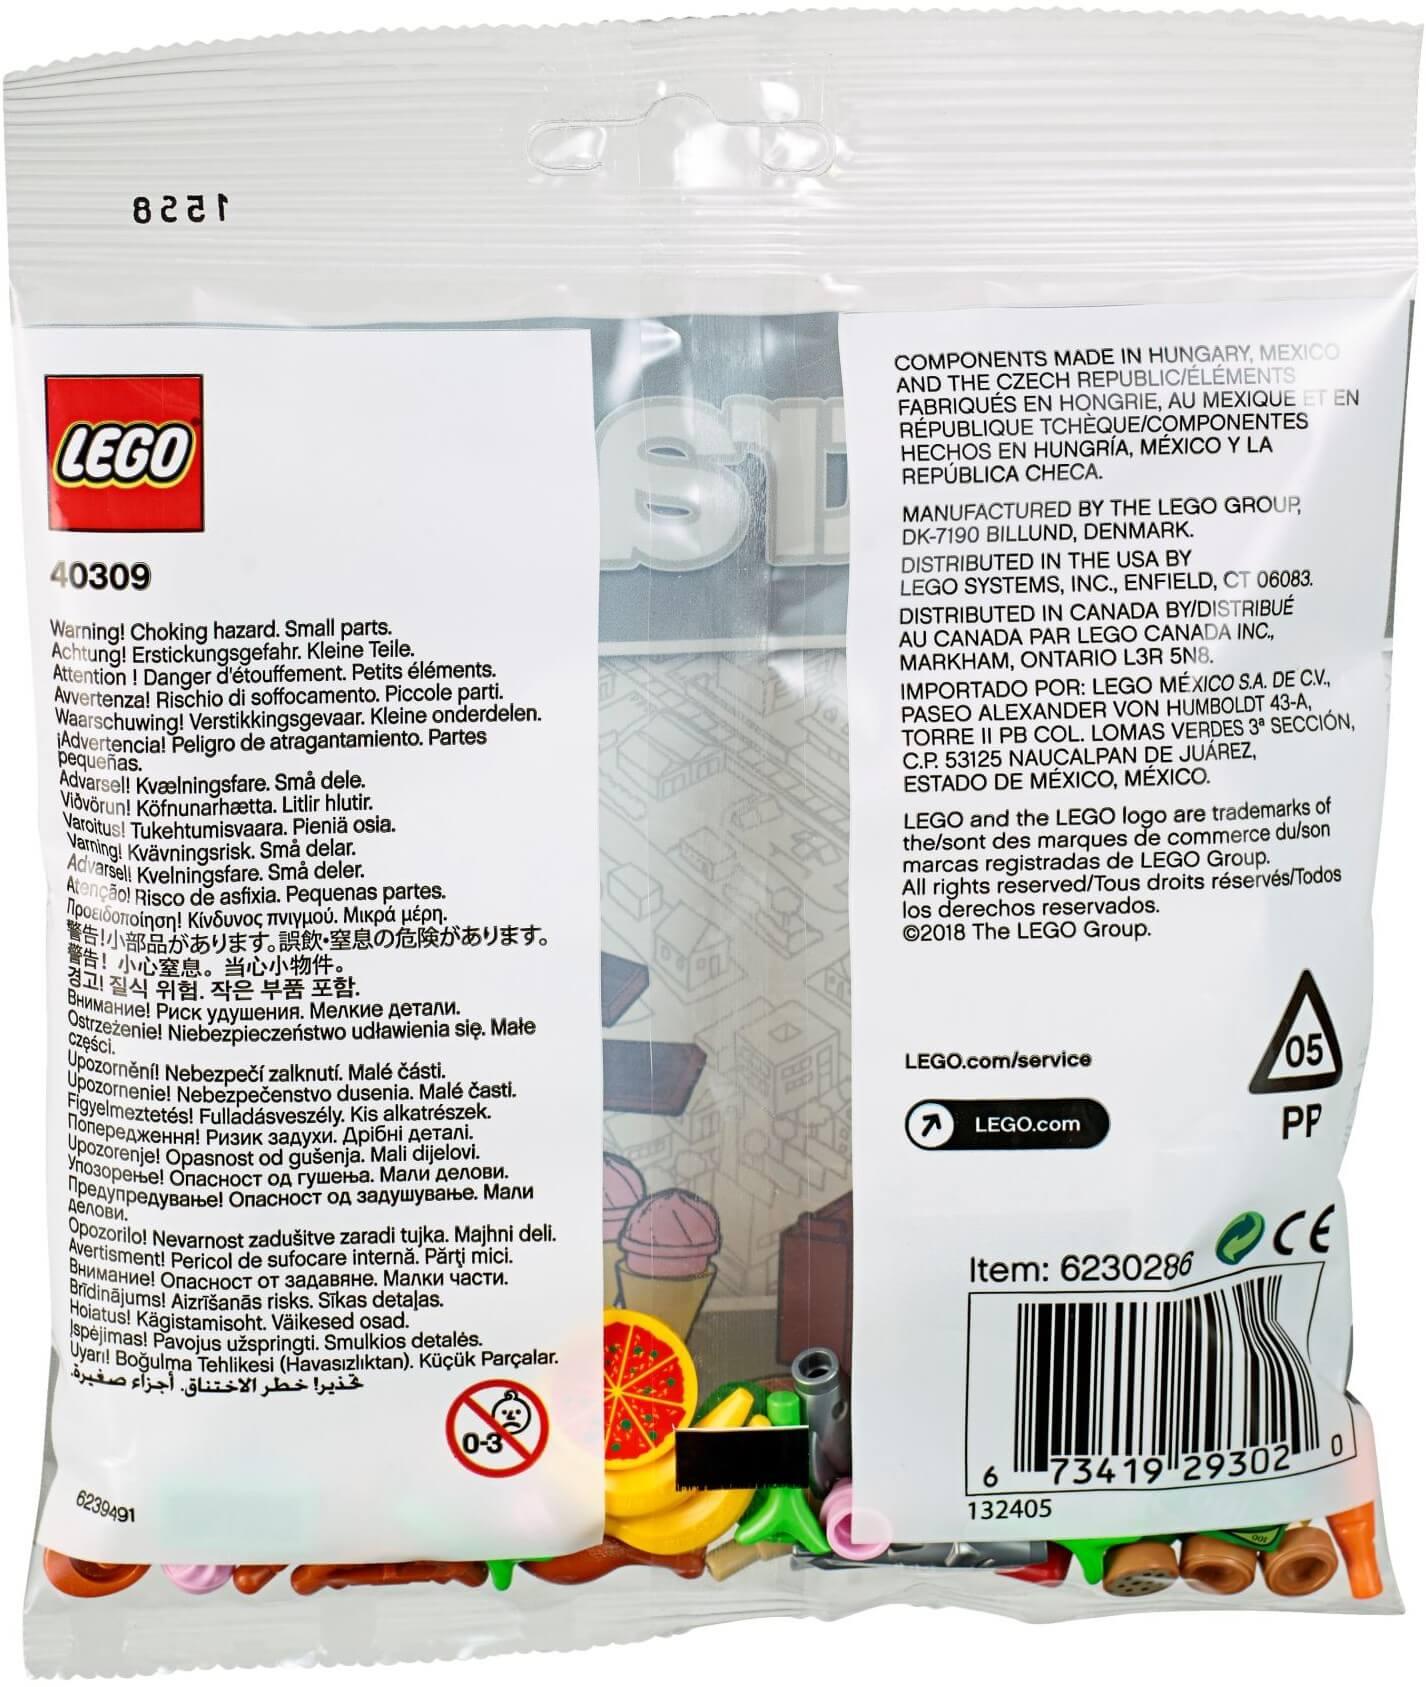 Mua đồ chơi LEGO 40309 - LEGO City 40309 - Bộ Xếp hình Thức Ăn (LEGO 40309 Food Accessories)